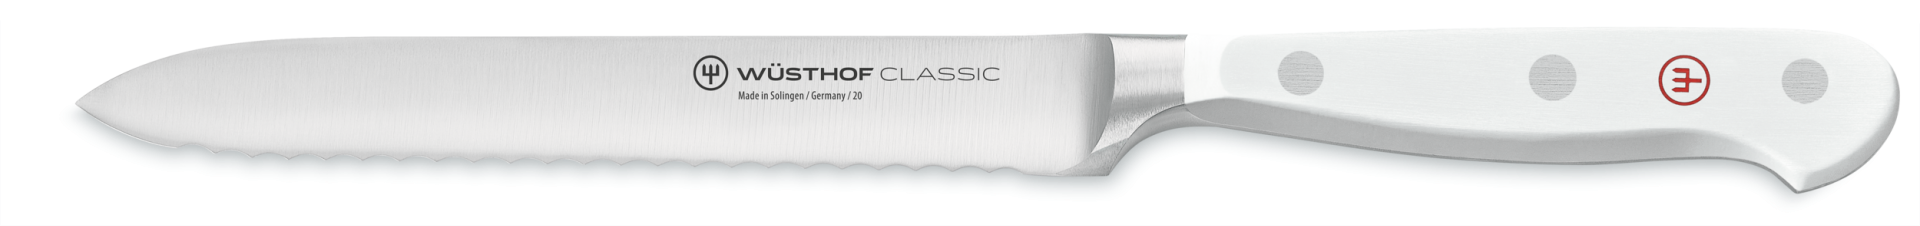 WÜSTHOF Wusthof Classic White nôž na údeniny 14 cm